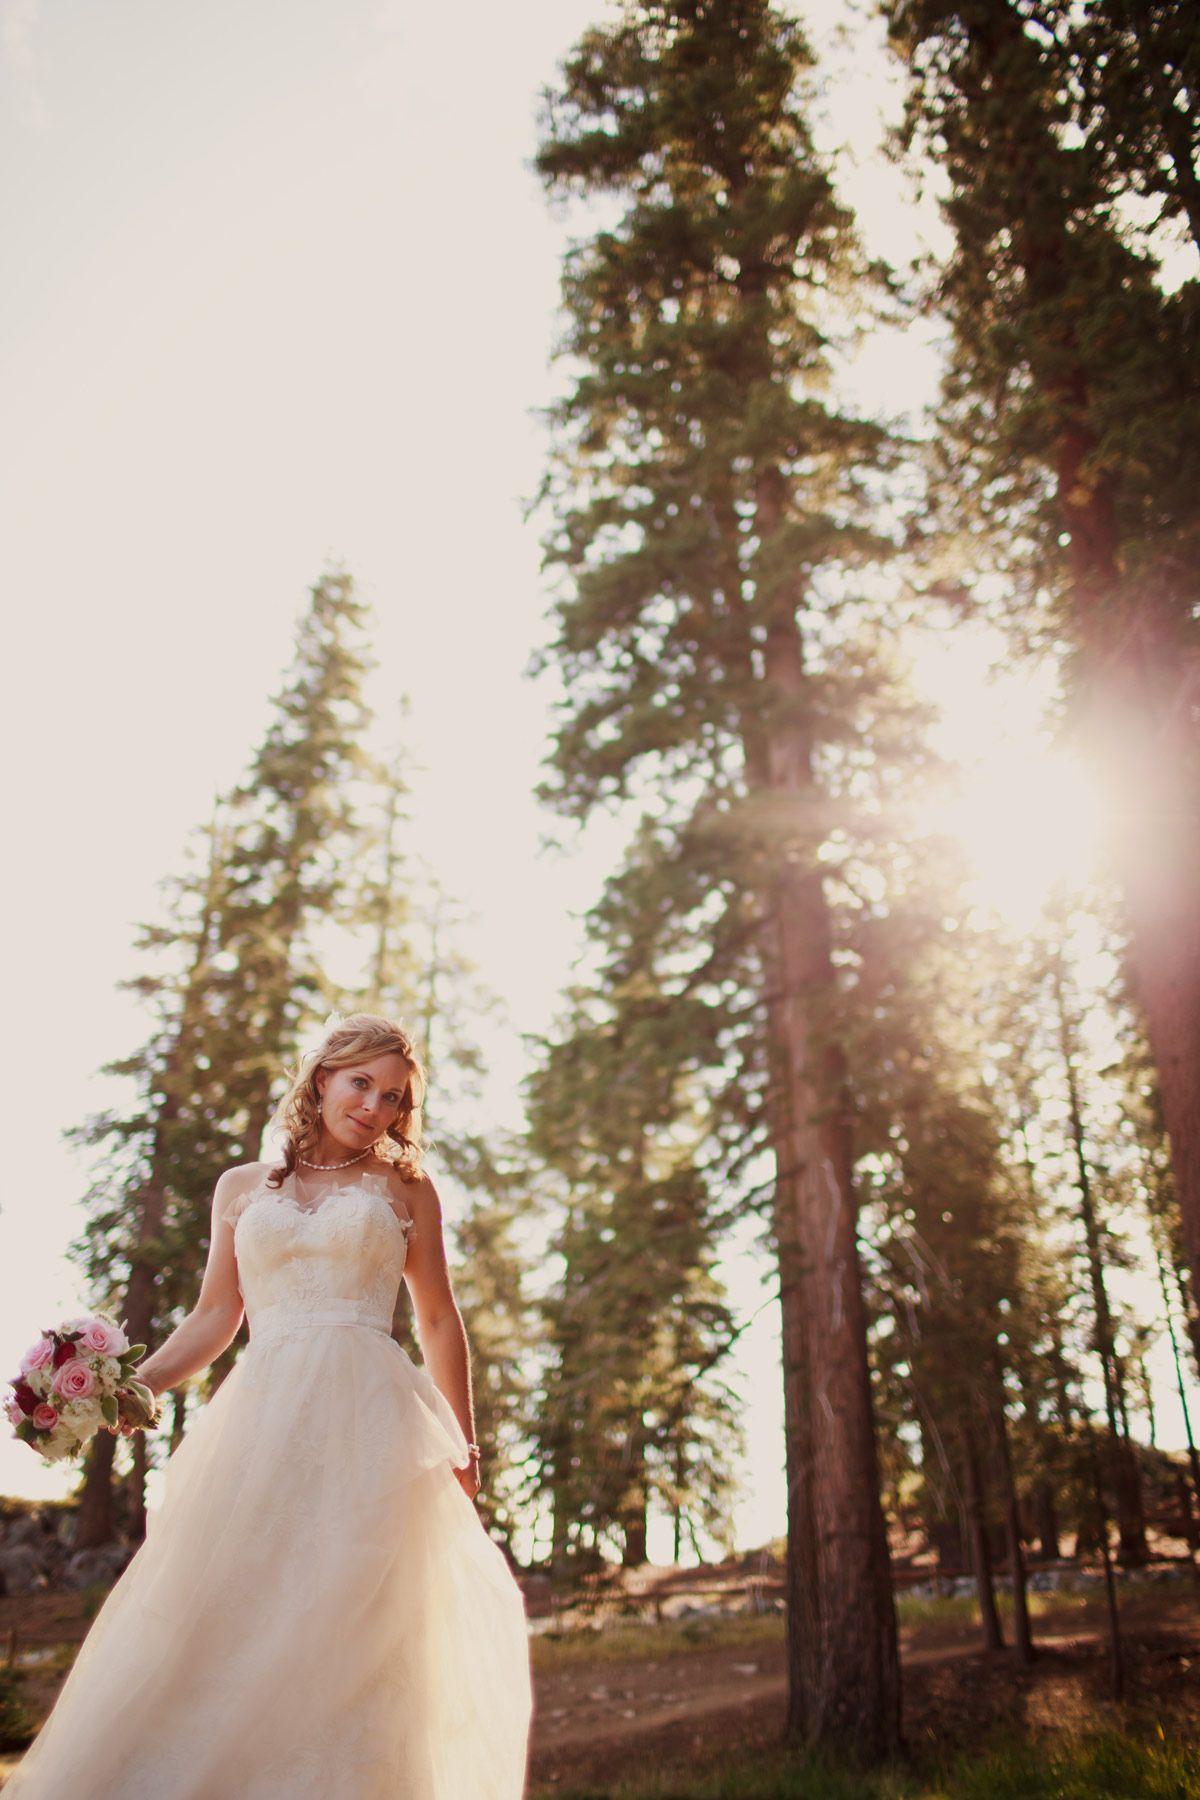 Yosemite Wedding | AddyRose Design | Patrick Pike Studios #addyroseweddings #yosemitewedding